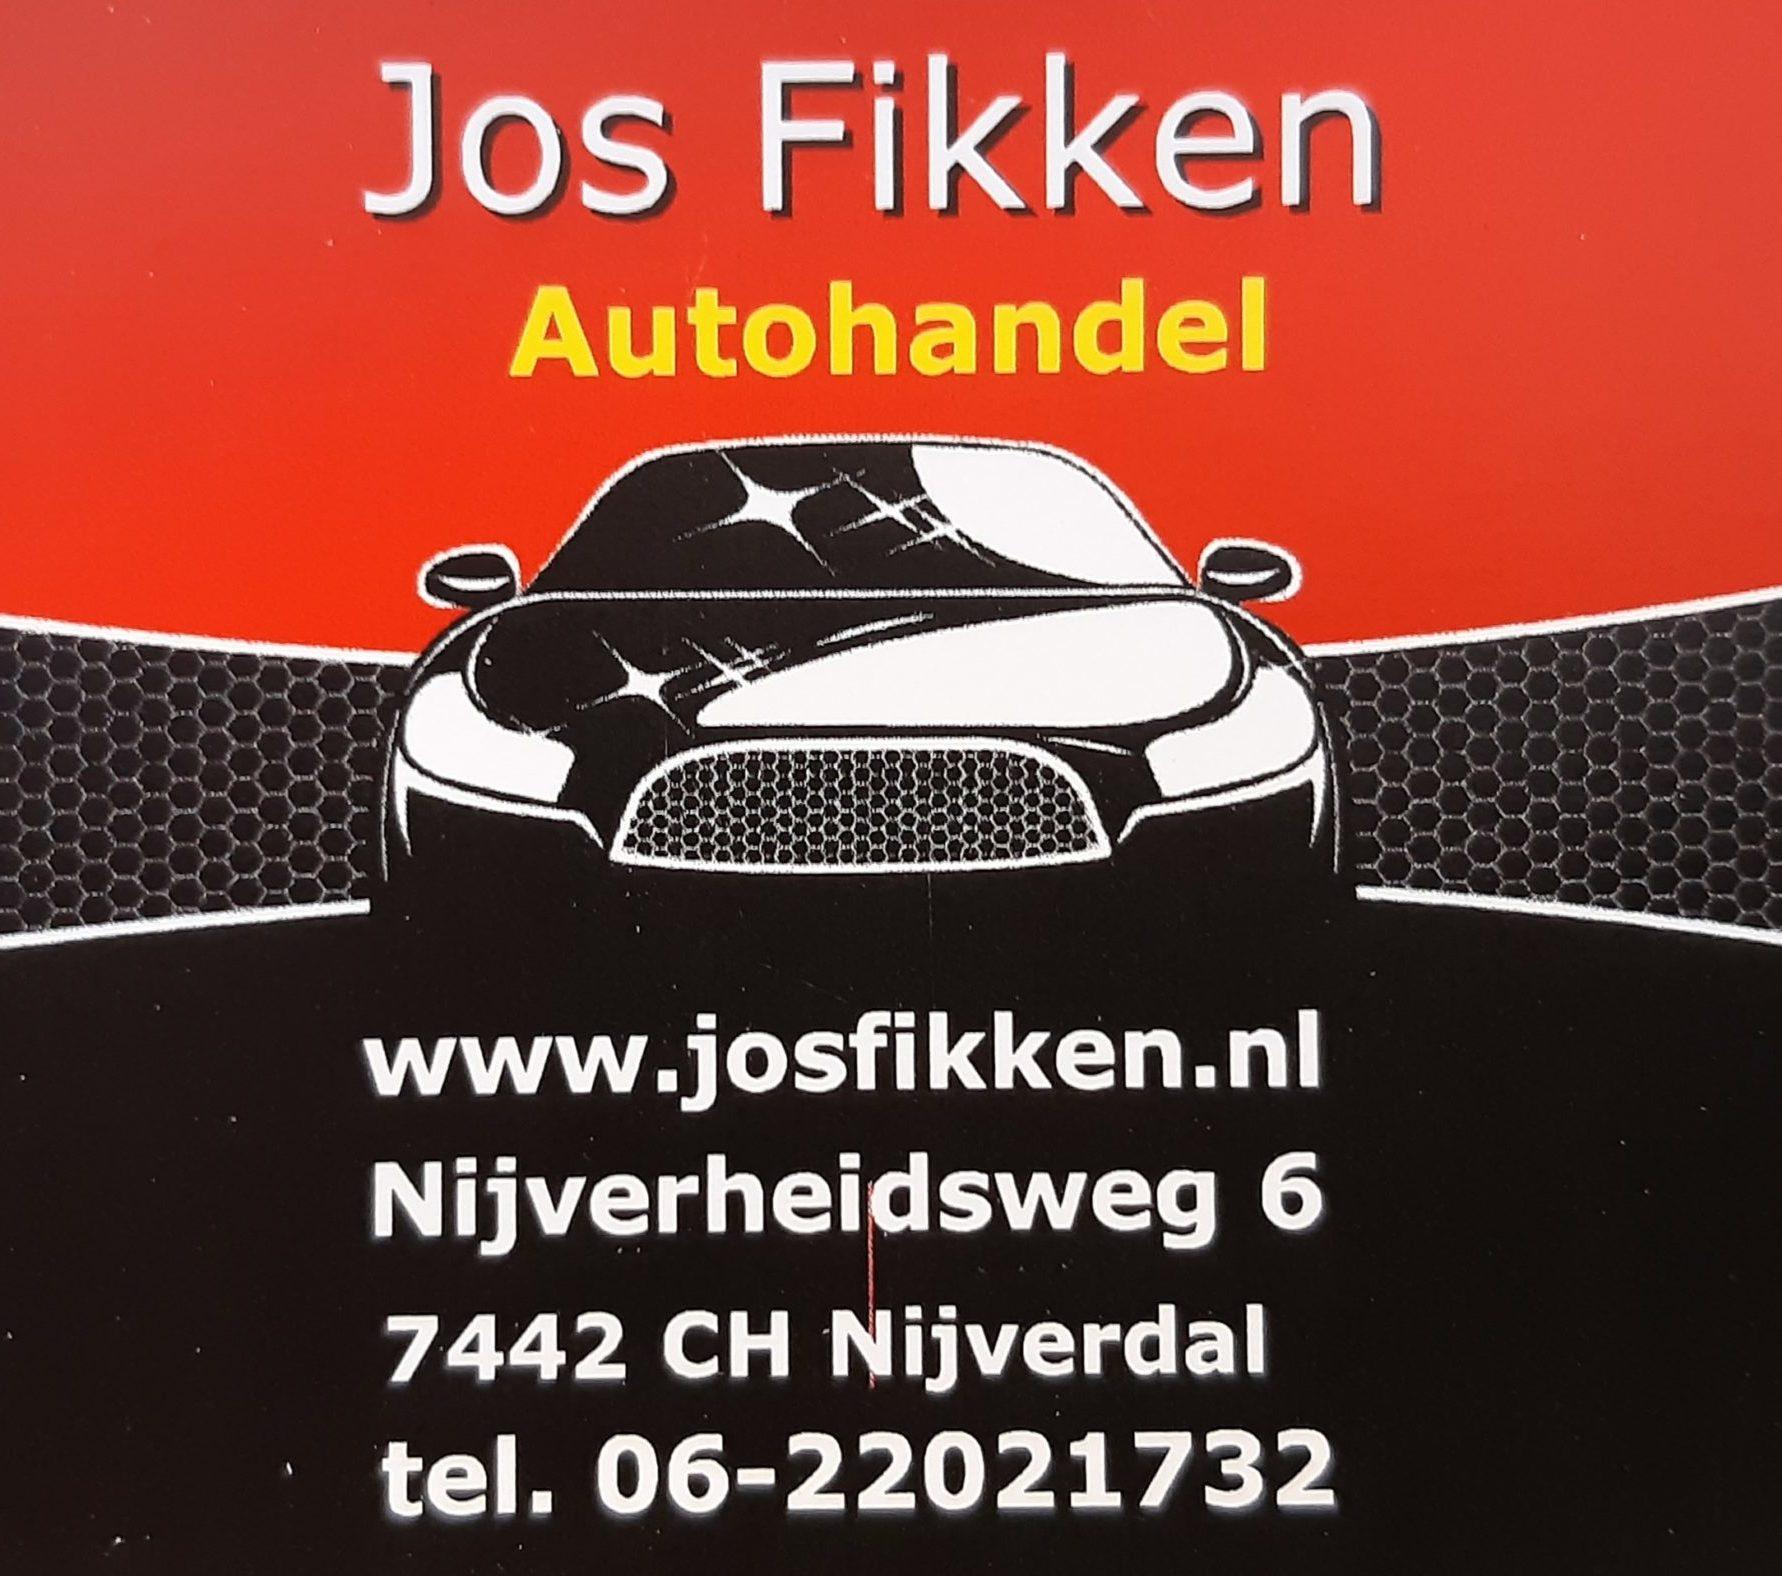 Josfikken.nl